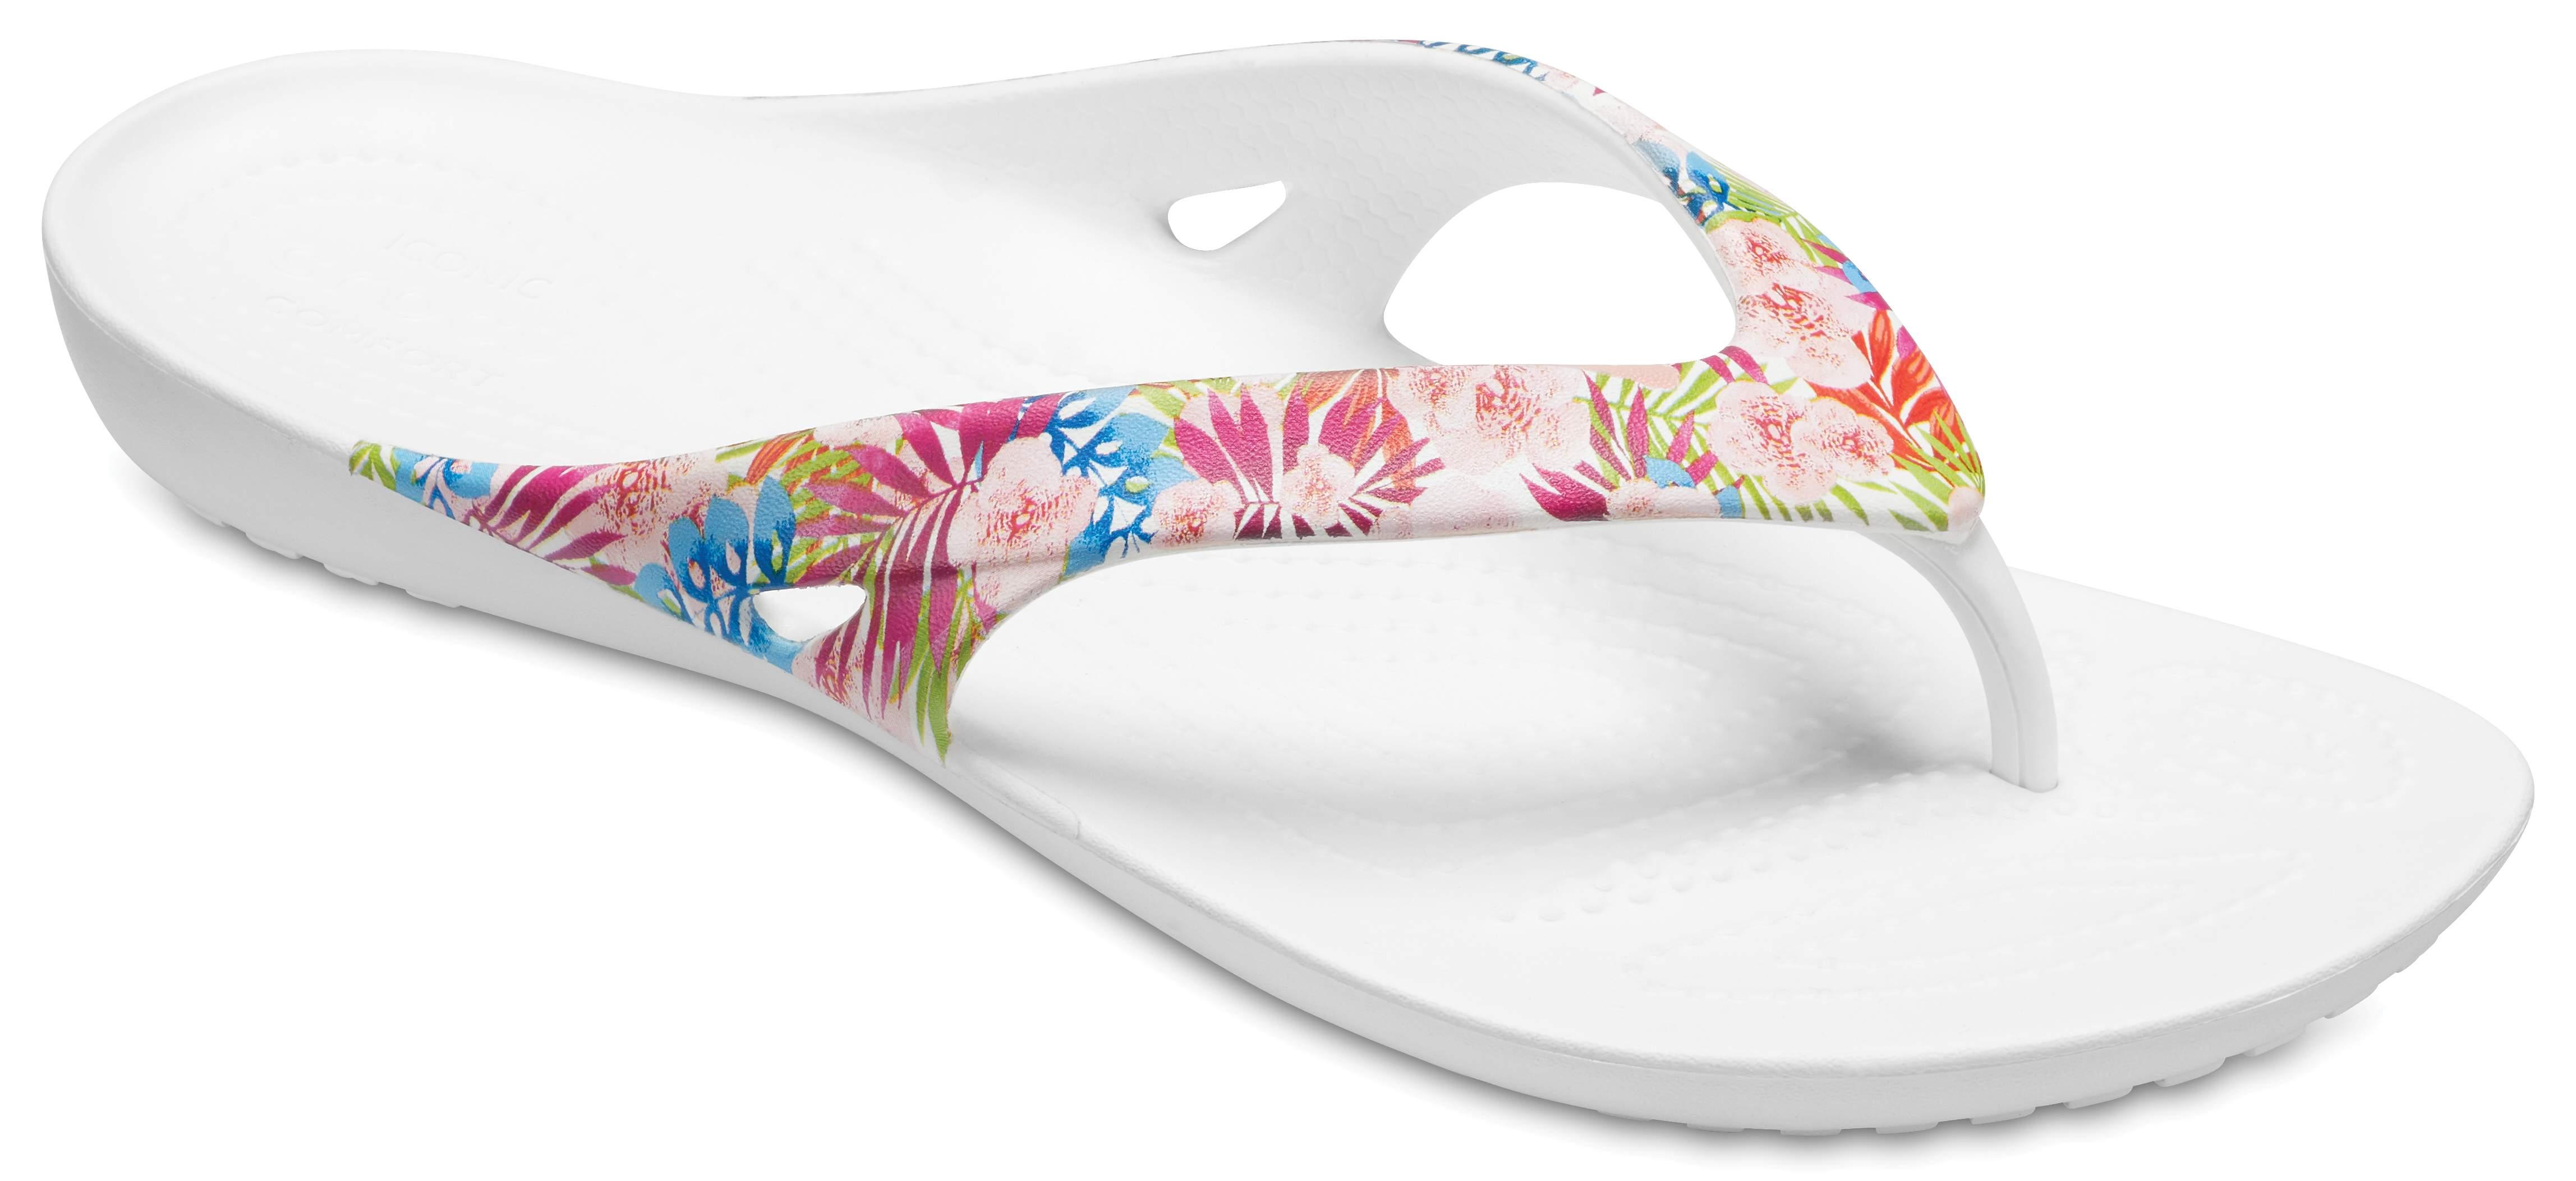 crocs Mujeres Kadee Ii Graphic W Flip Flop, Flamingo, 7 M US